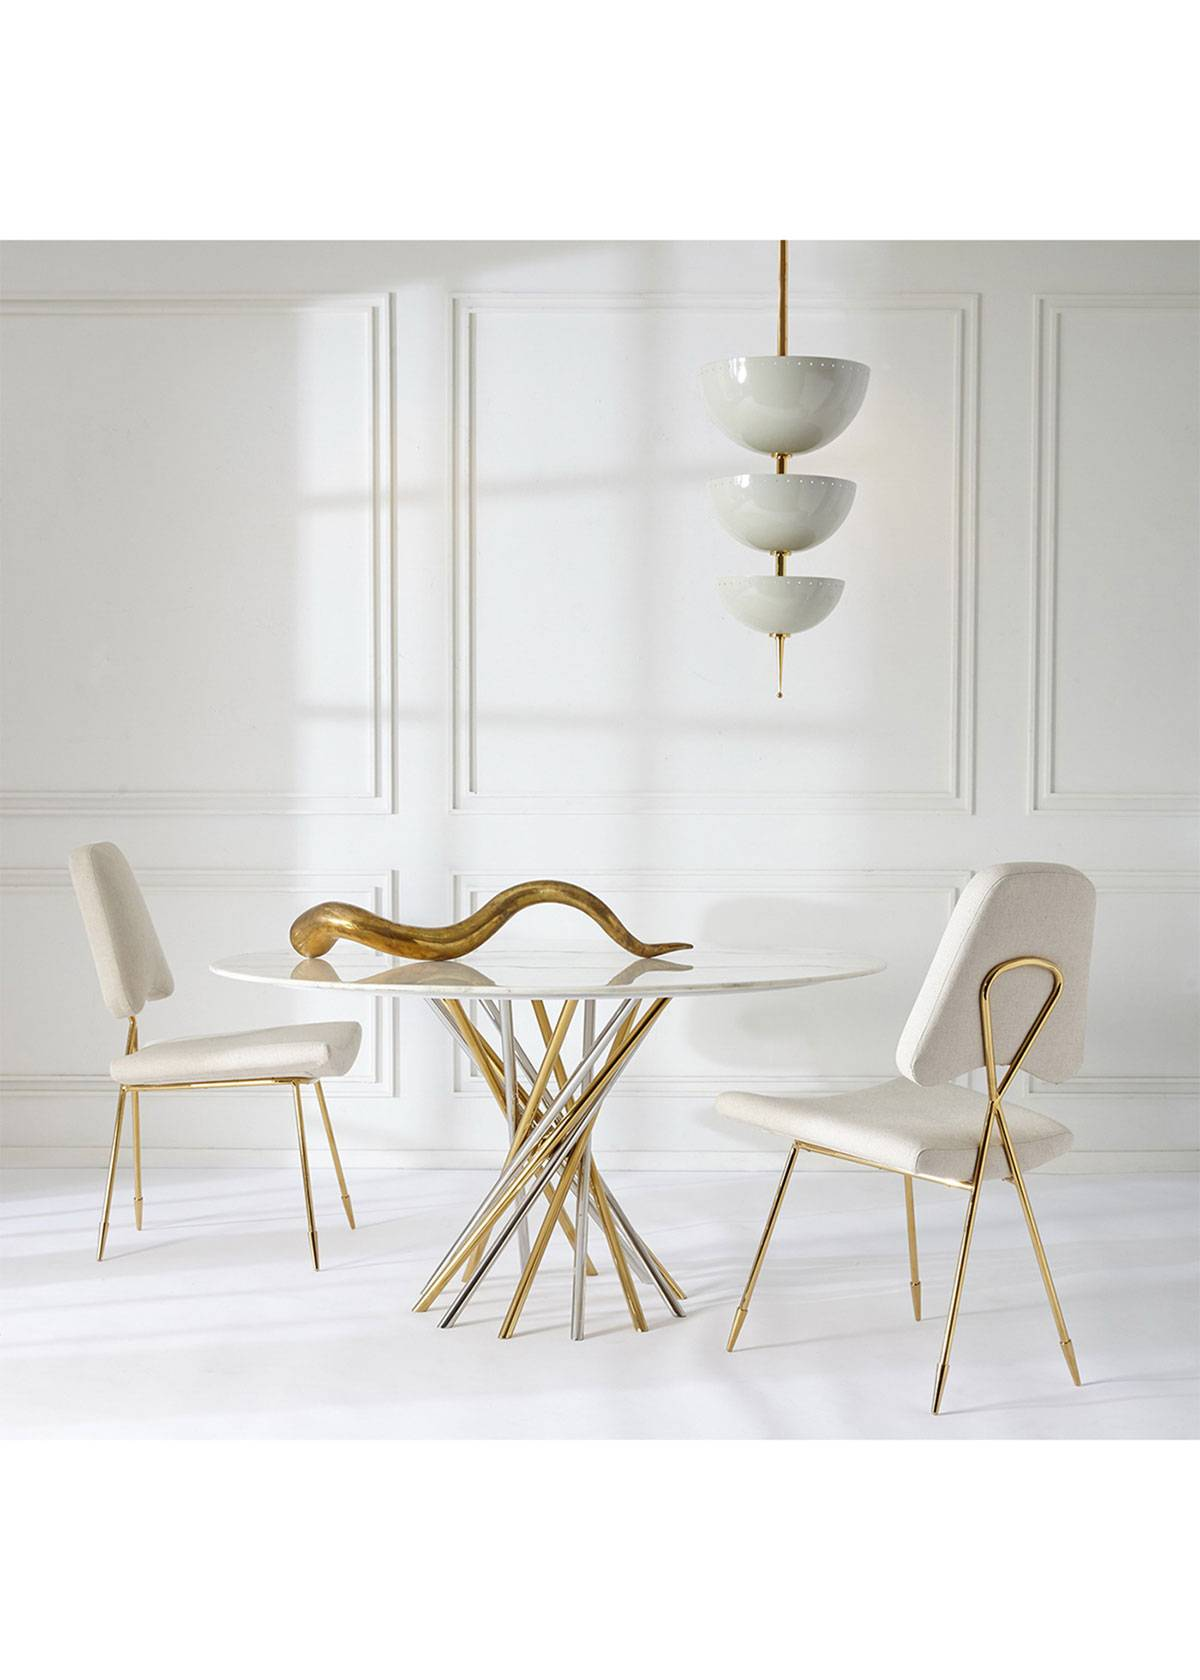 Jonathan Adler Electrum Dining Table  - Size: unisex